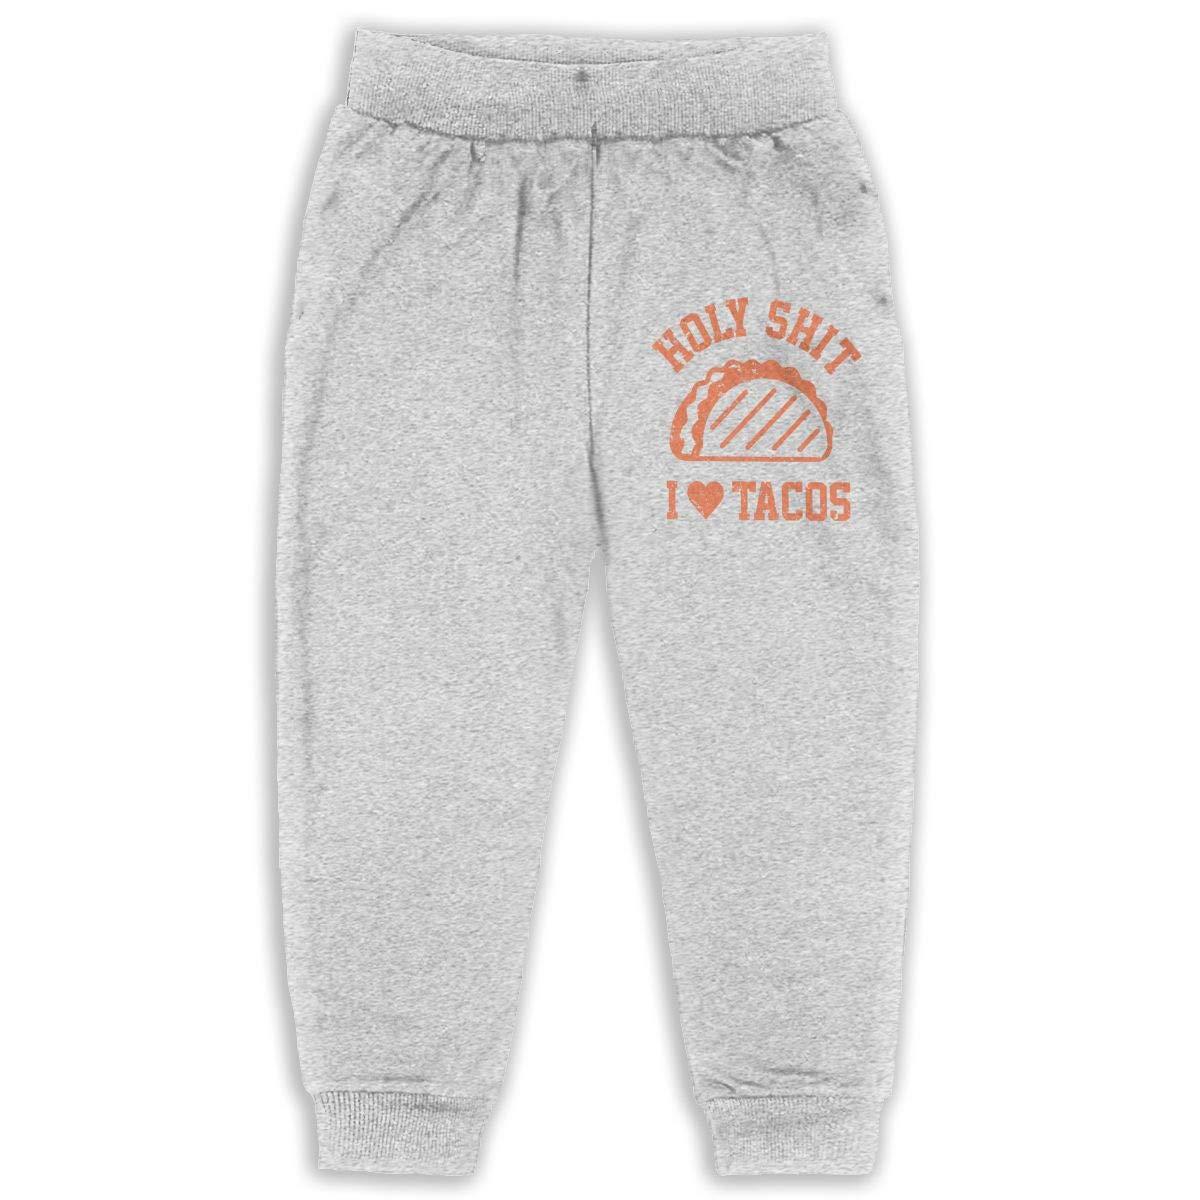 I Love Tacos Holy Shit Child Boys Girls Unisex Sports Sweatpants Kids Casual Jogger Pants